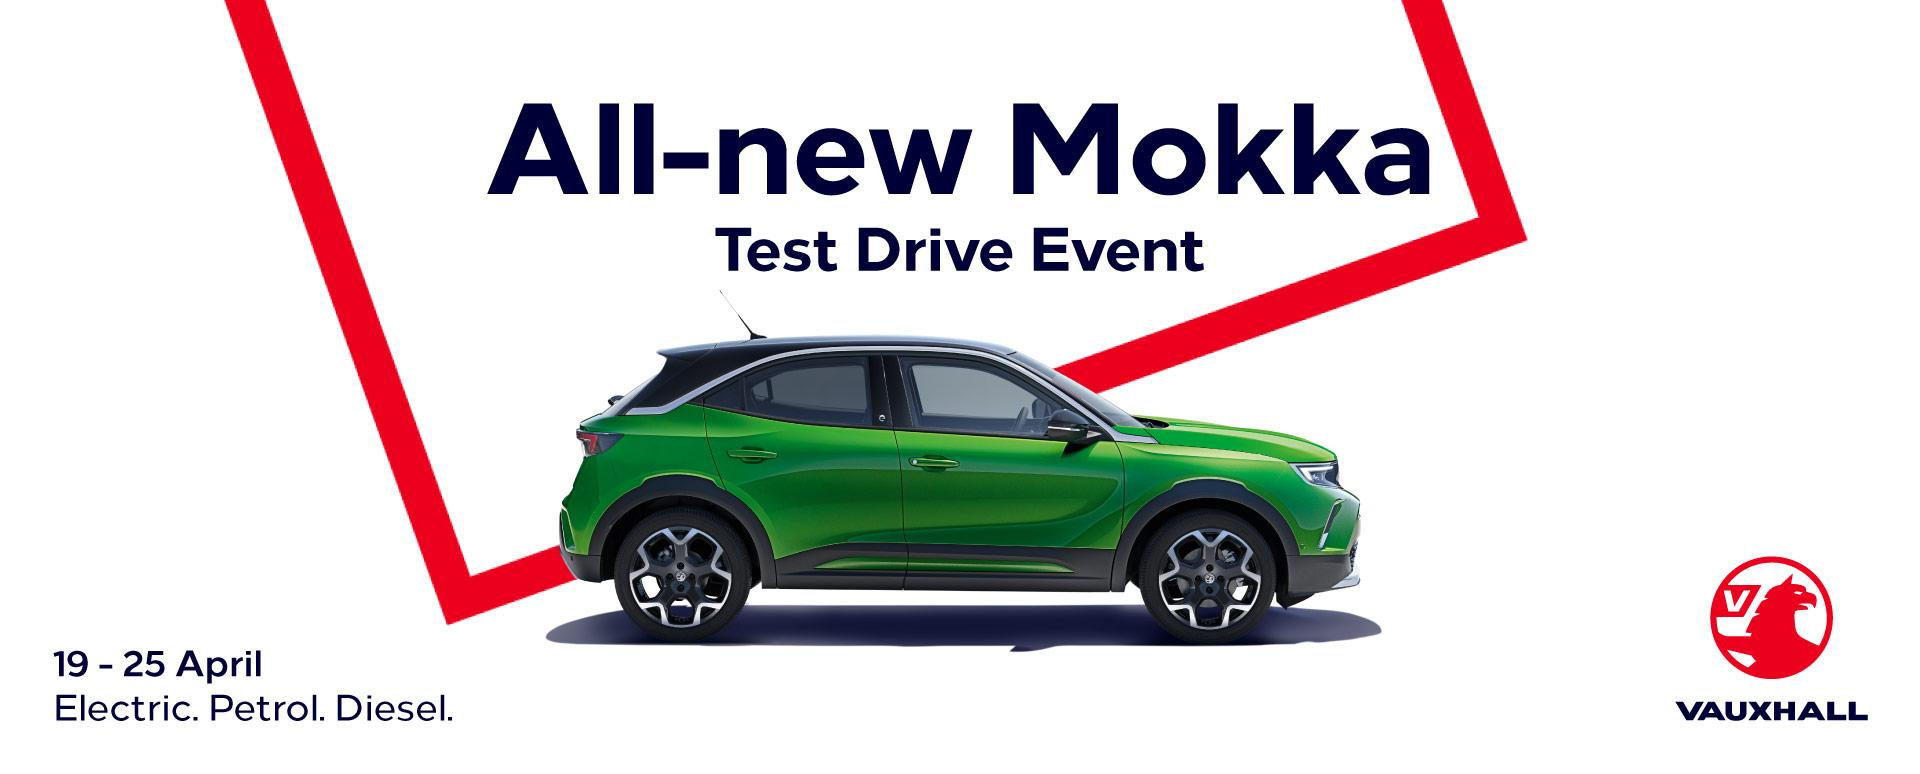 All-New Mokka Test Drive Event